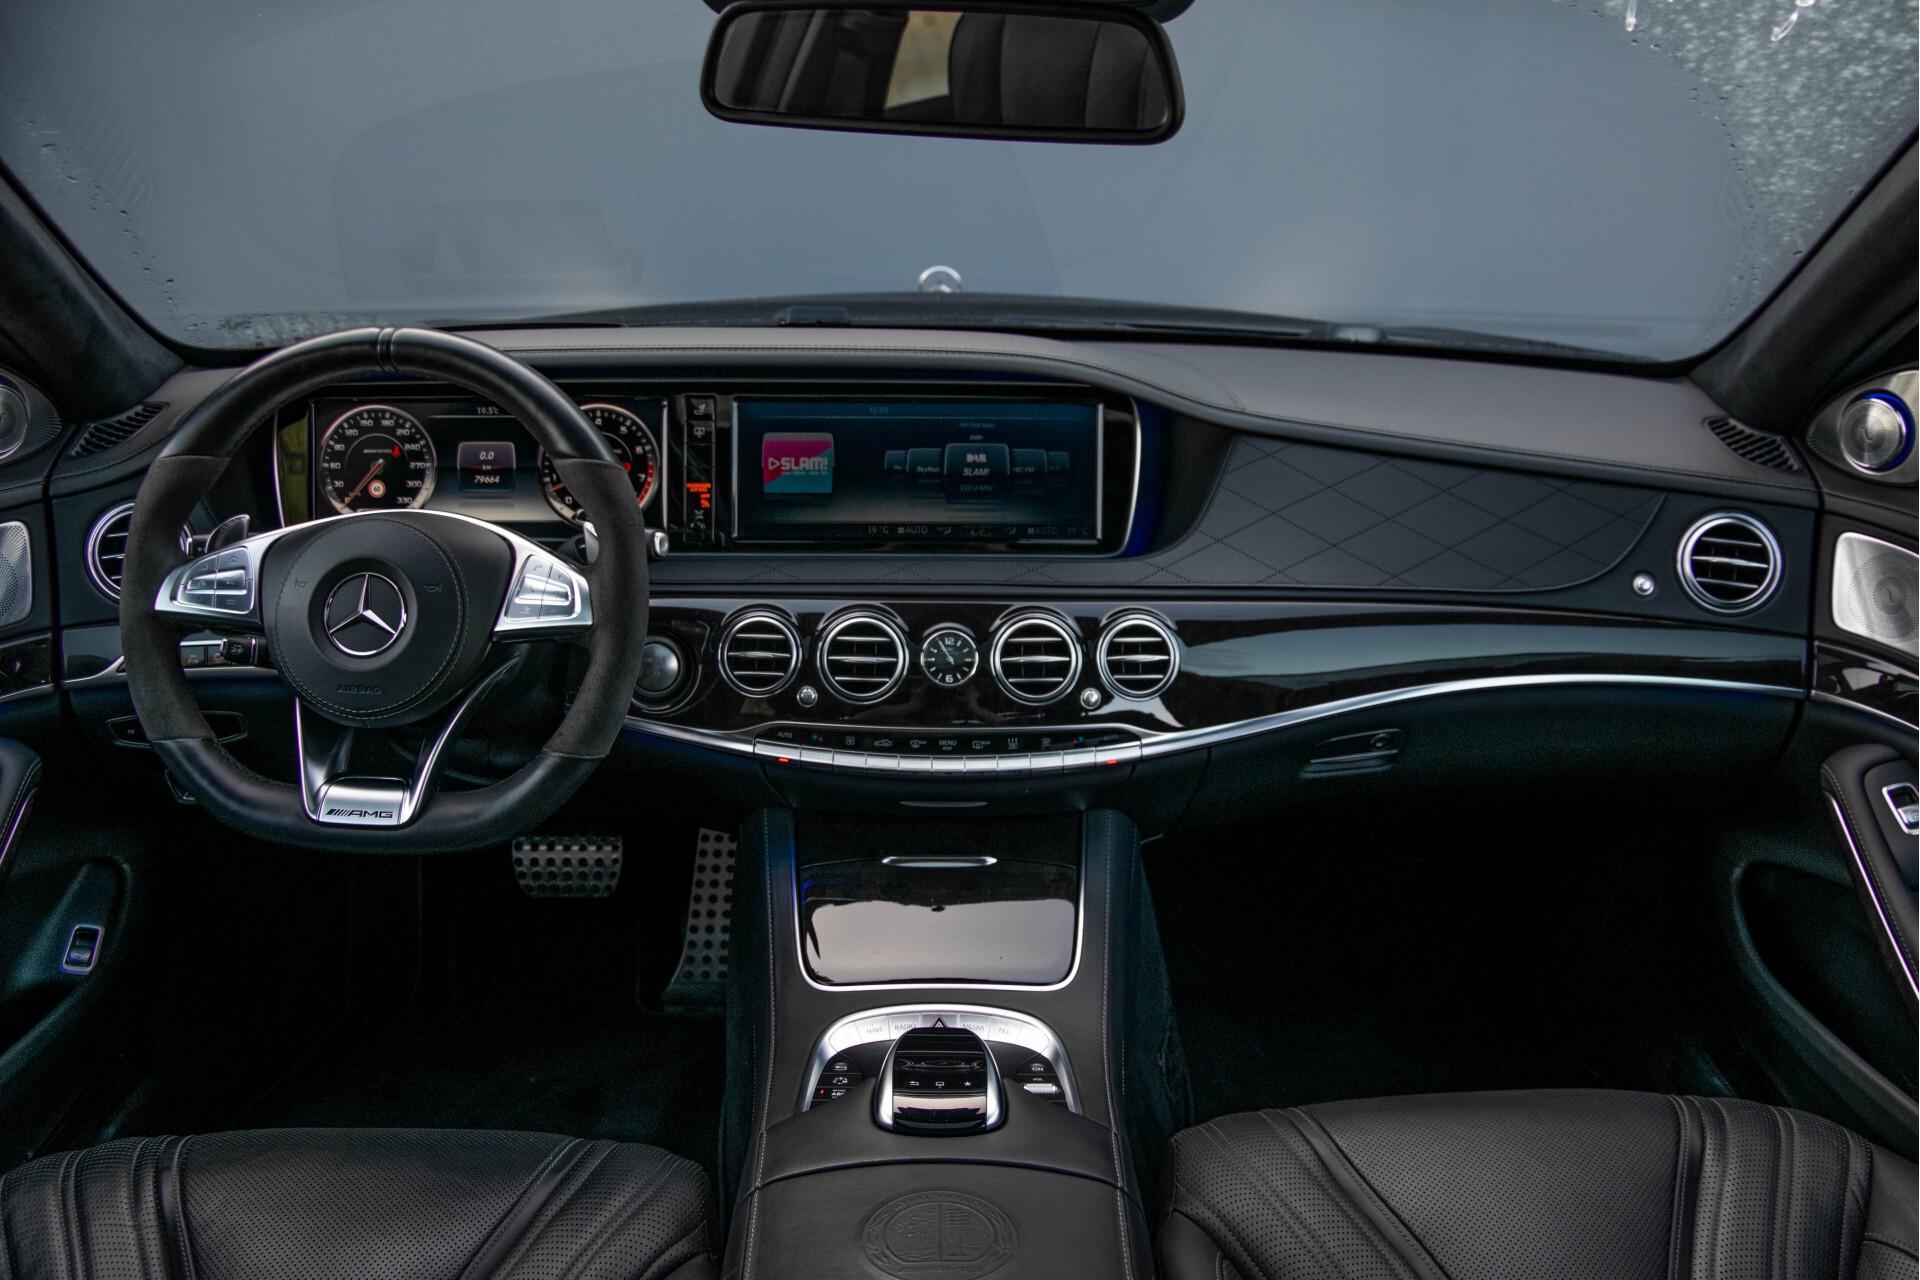 Mercedes-Benz S-Klasse 63 AMG Exclusive/Burmester High-End/Driverspack Aut7 Foto 7